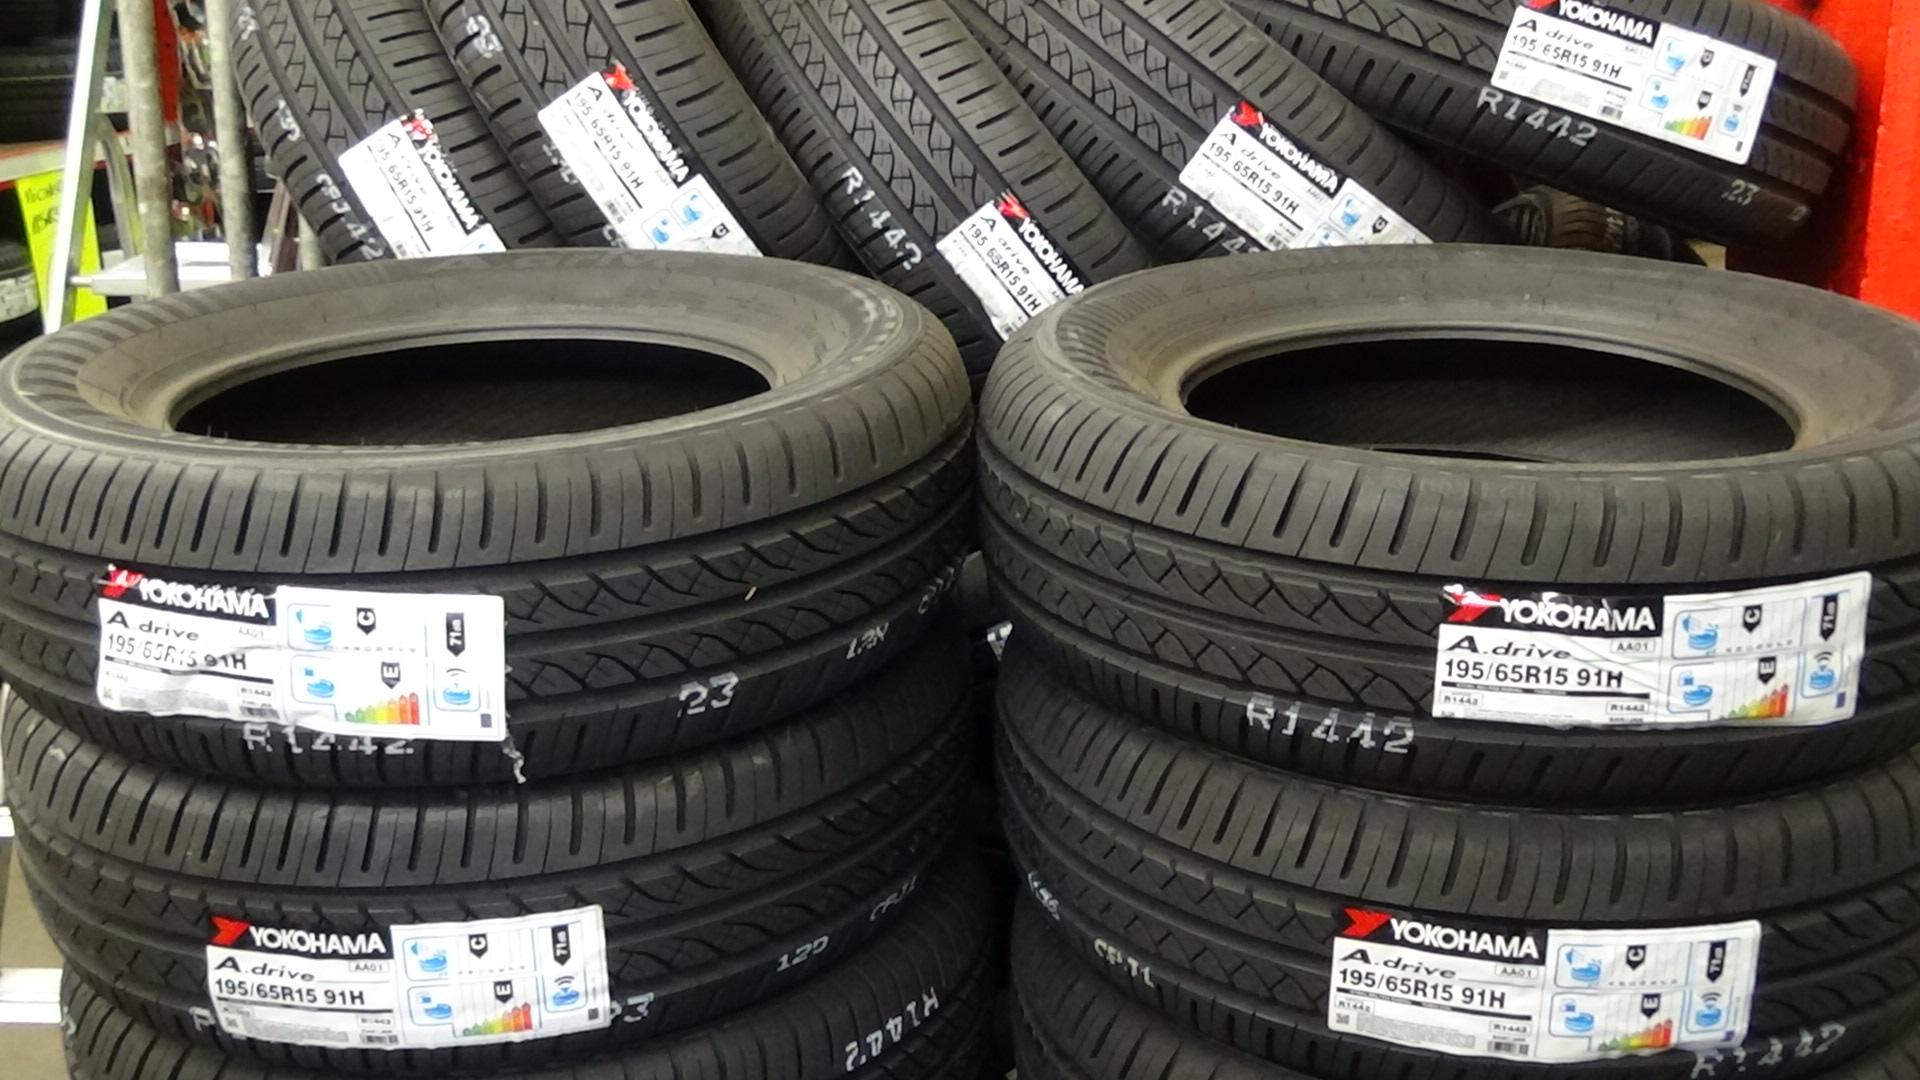 Arrivage de pneus Yokohama en magasin